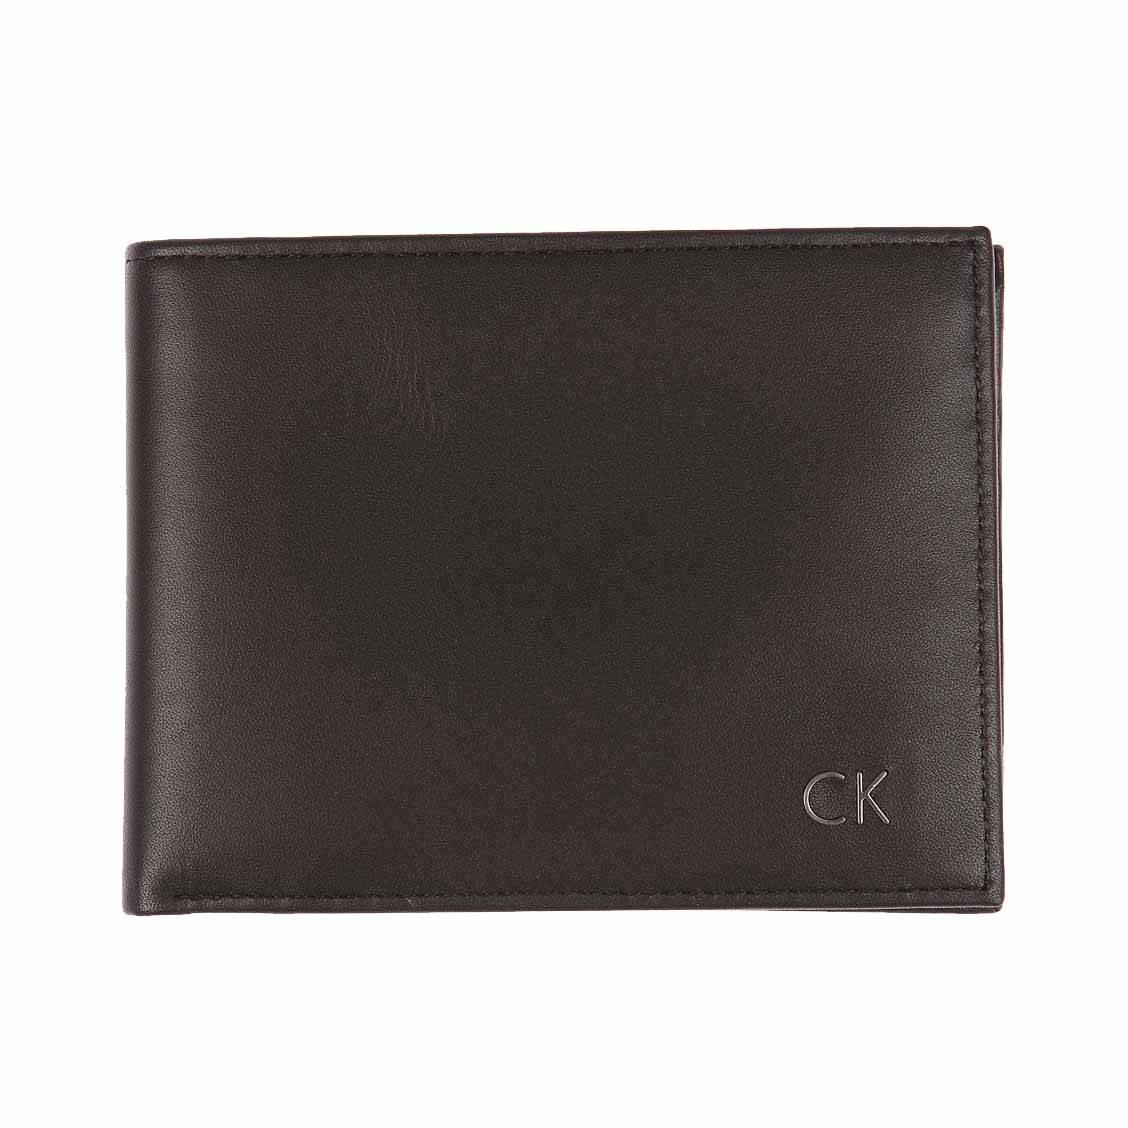 Calvin Klein Portefeuille européen en cuir - 8 cartes Noir RIgQDL